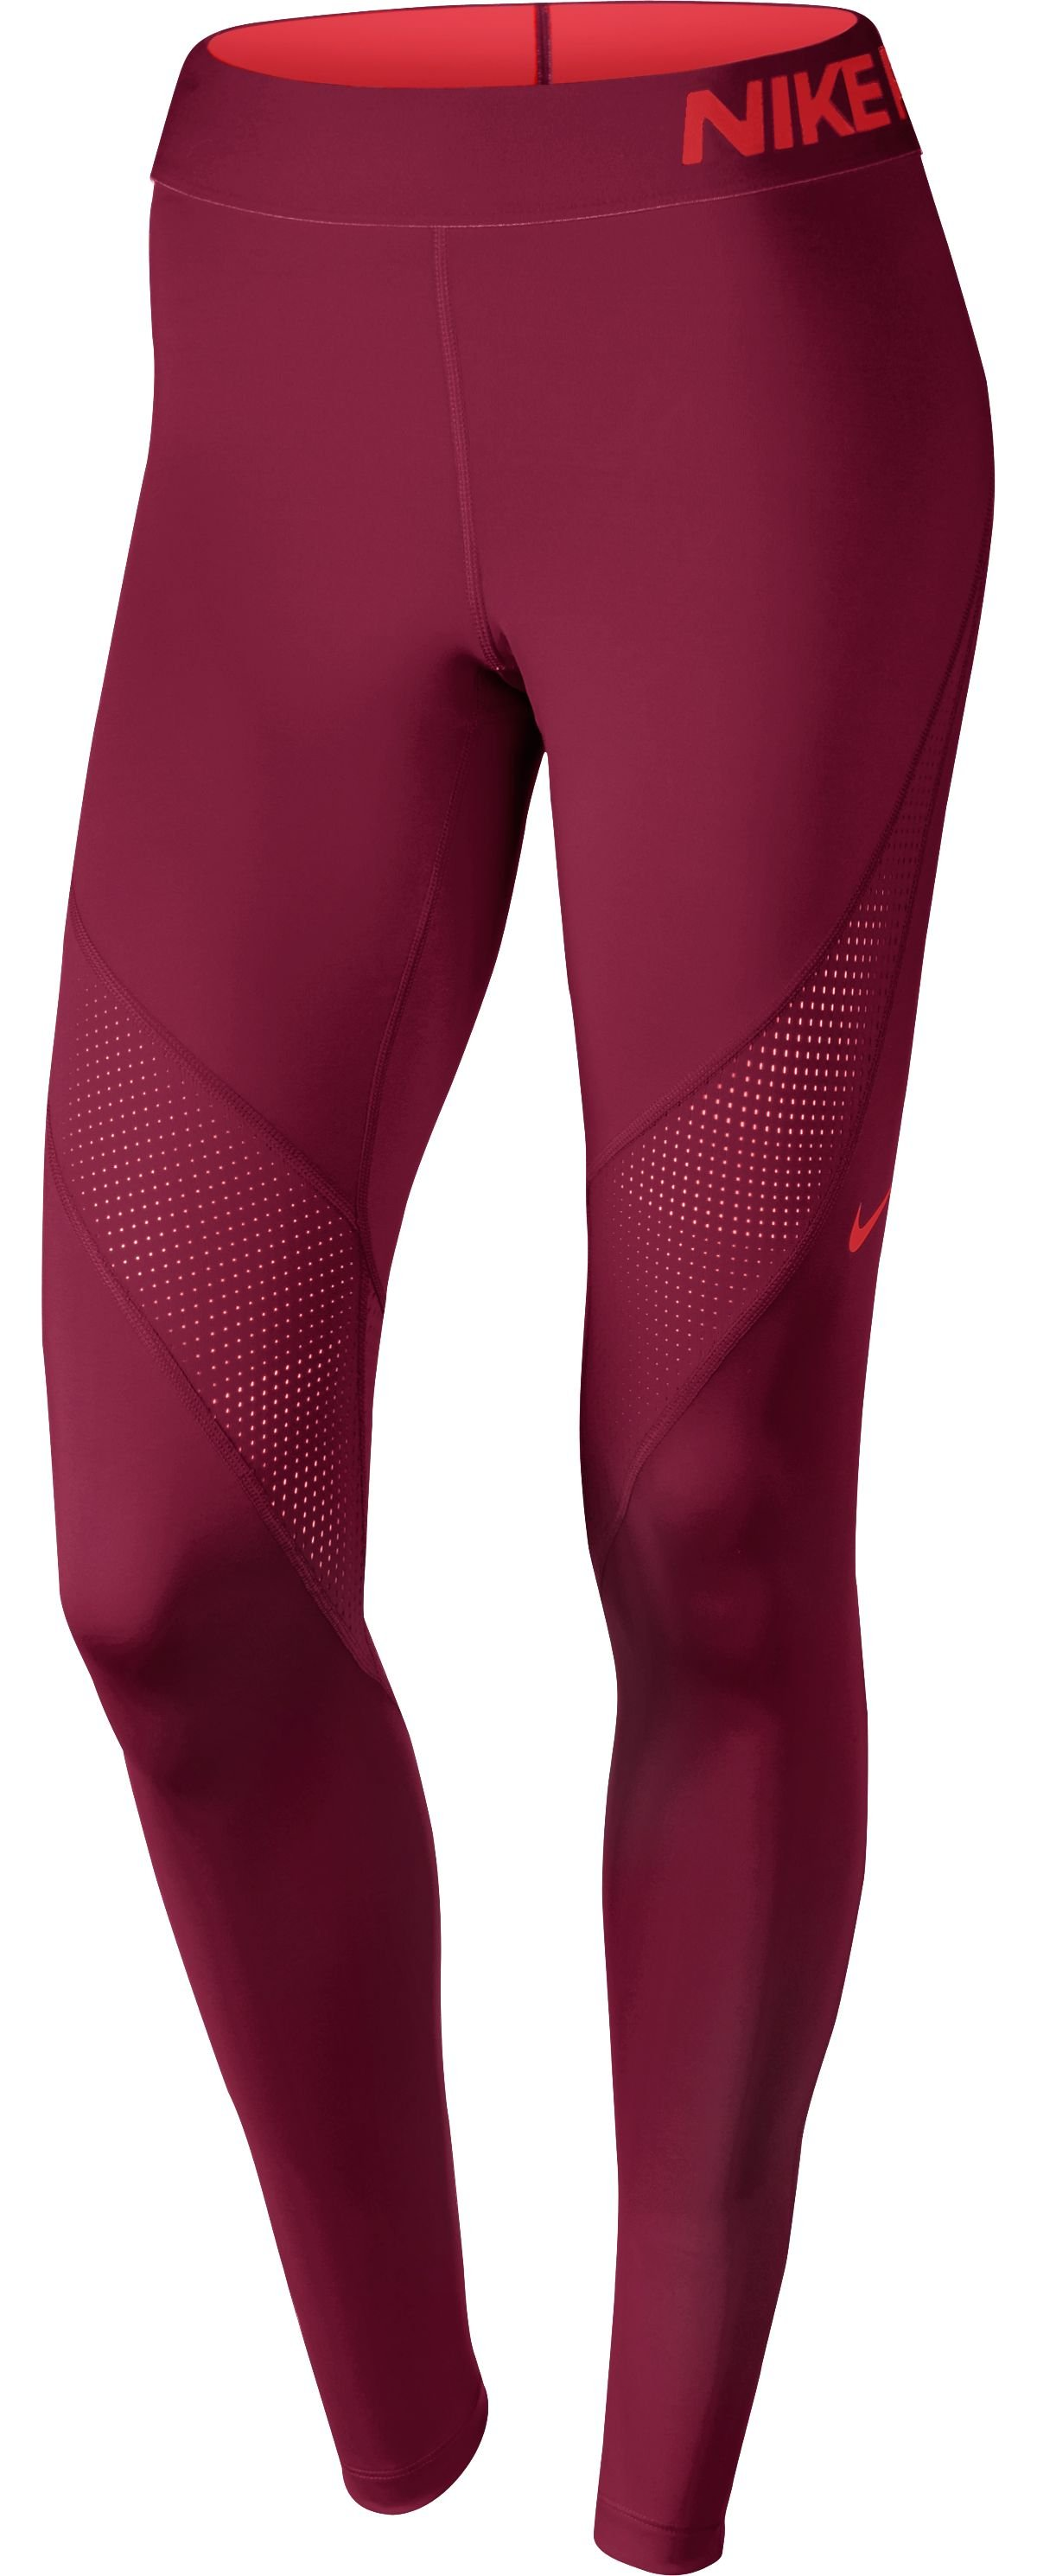 Kalhoty Nike PRO HYPERCOOL TIGHT